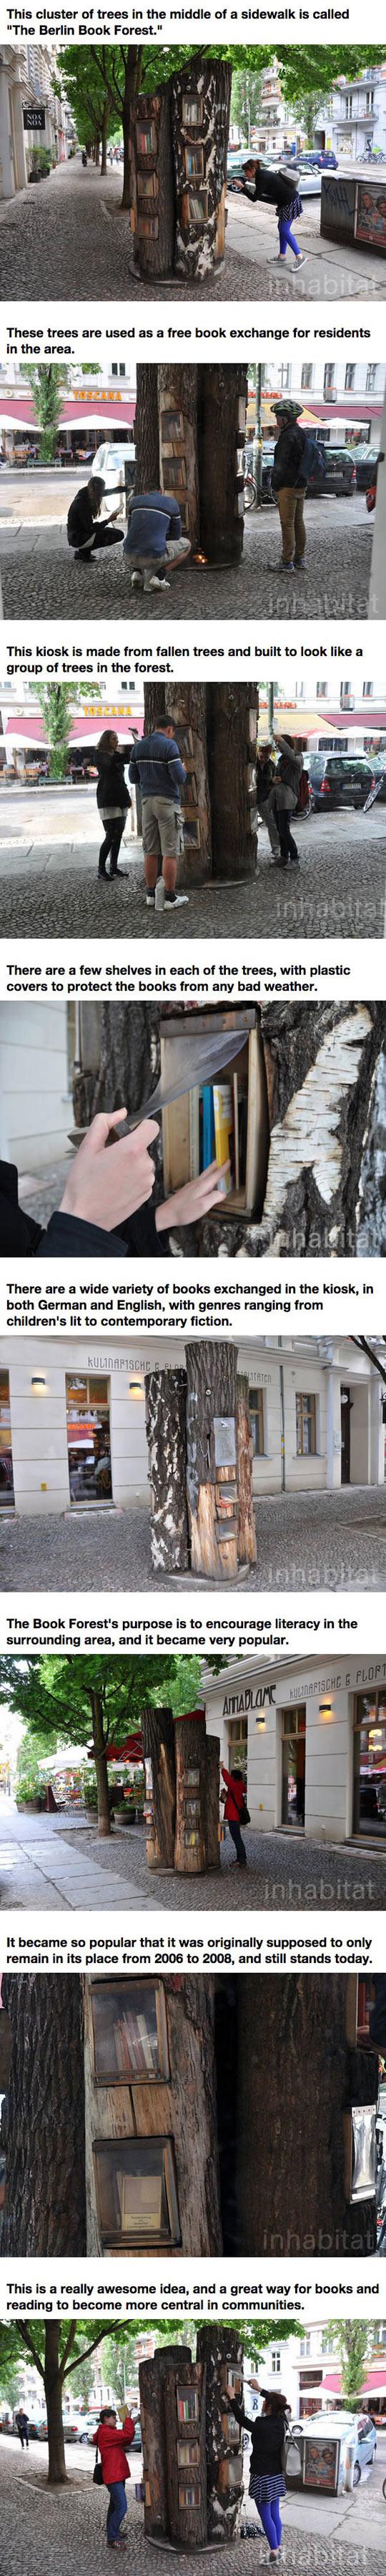 Book Forest In Berlin